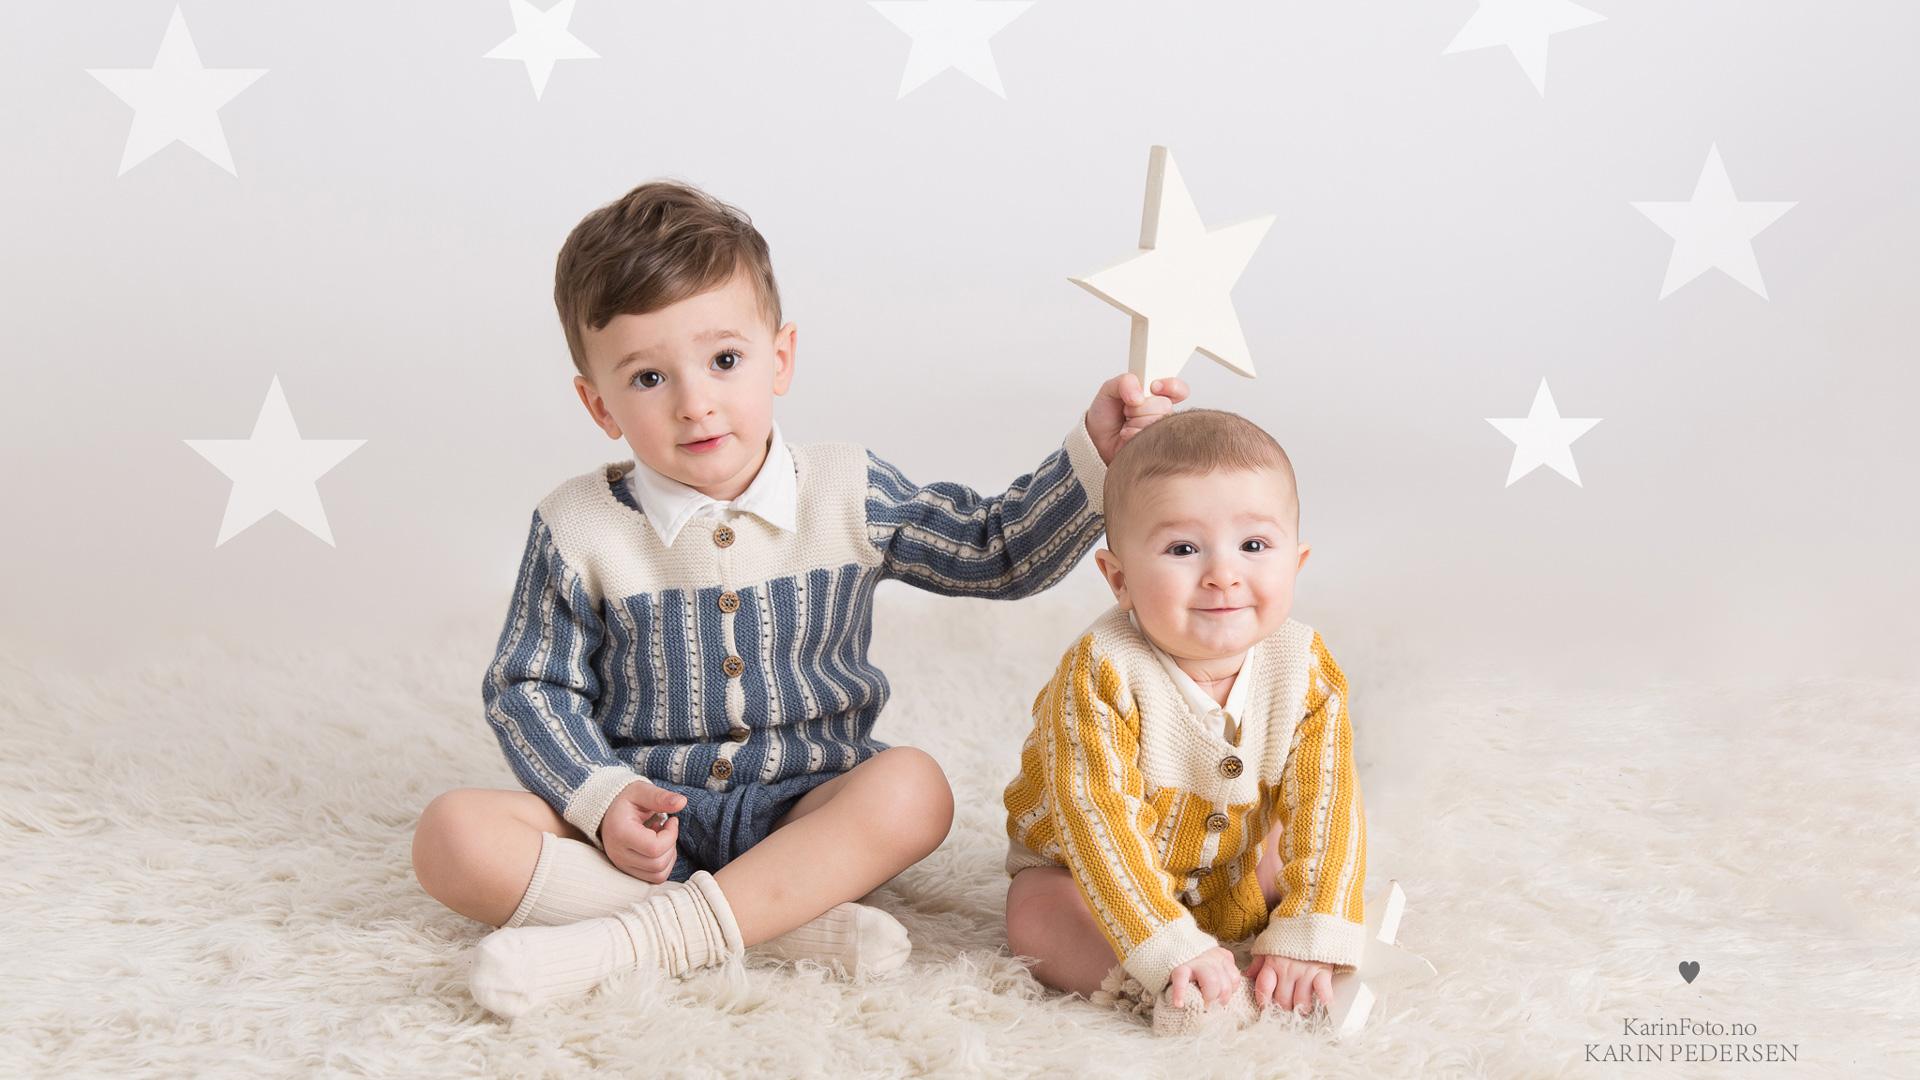 Barnefotograf_KarinPedersen,babyfotograf,babyfoto,barnefoto,Memini,søskenfoto,sarpsborg